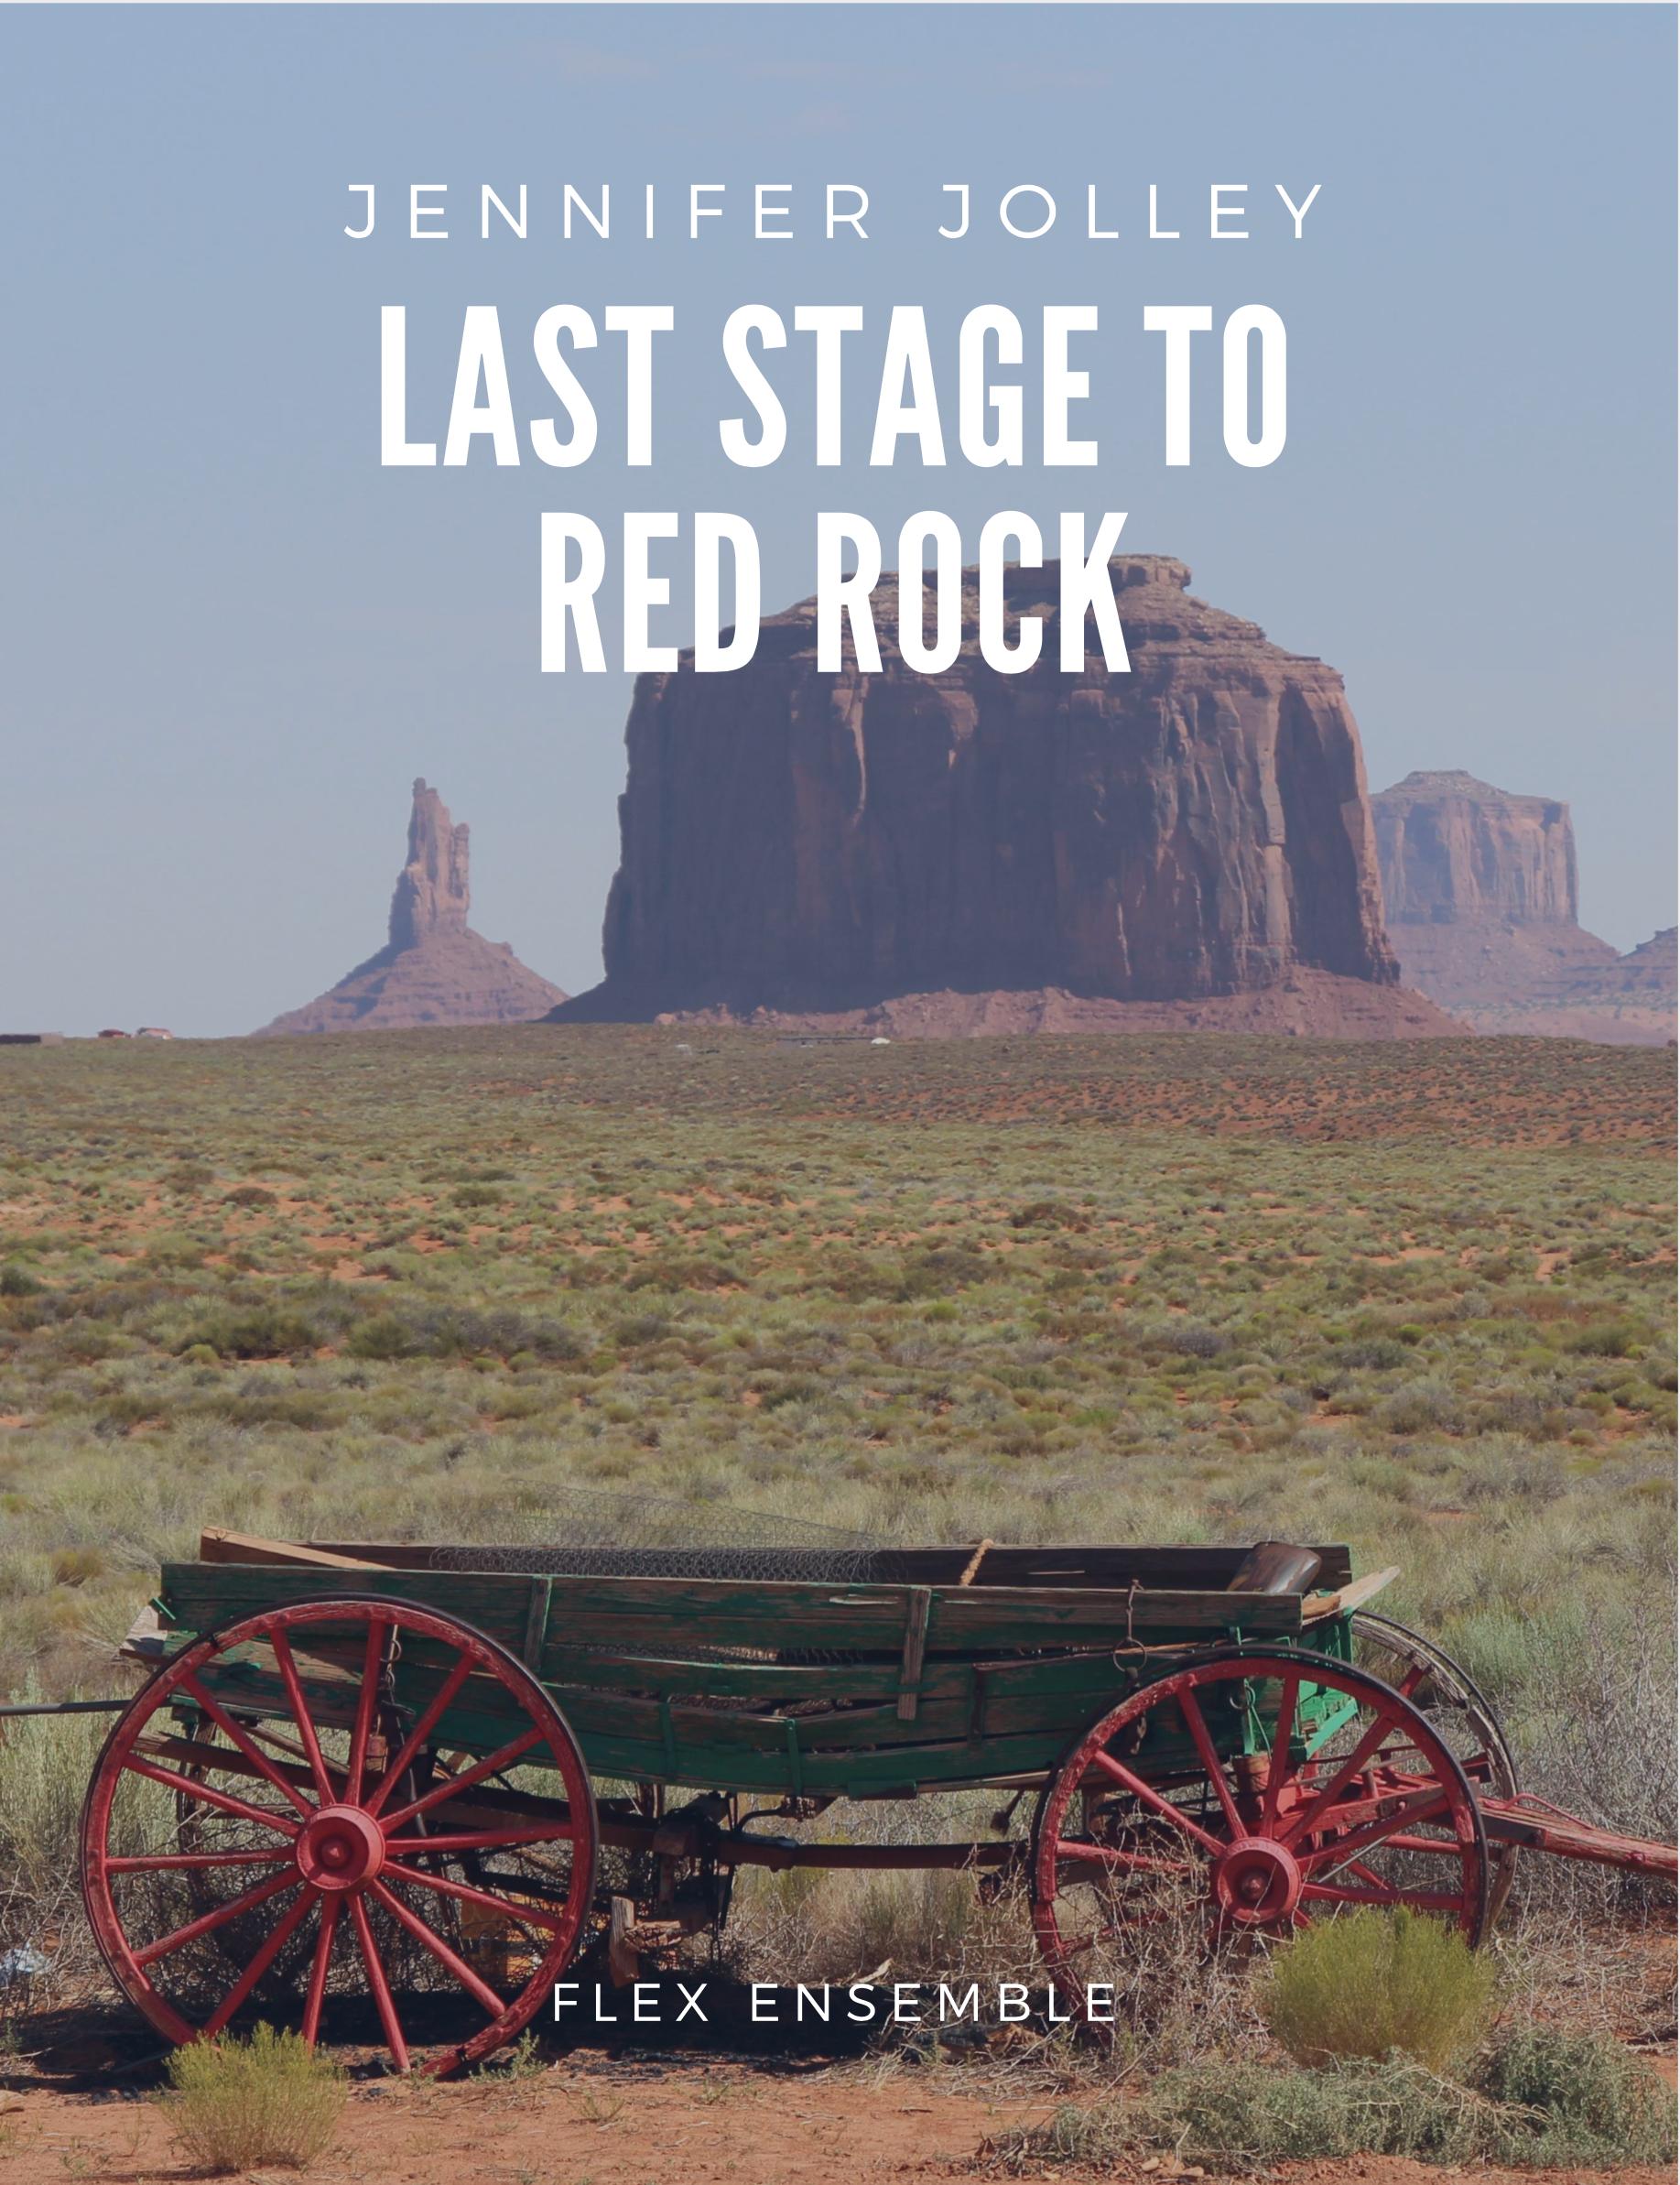 Last Stage To Red Rock (Flex Version Score Only) by Jennifer Jolley